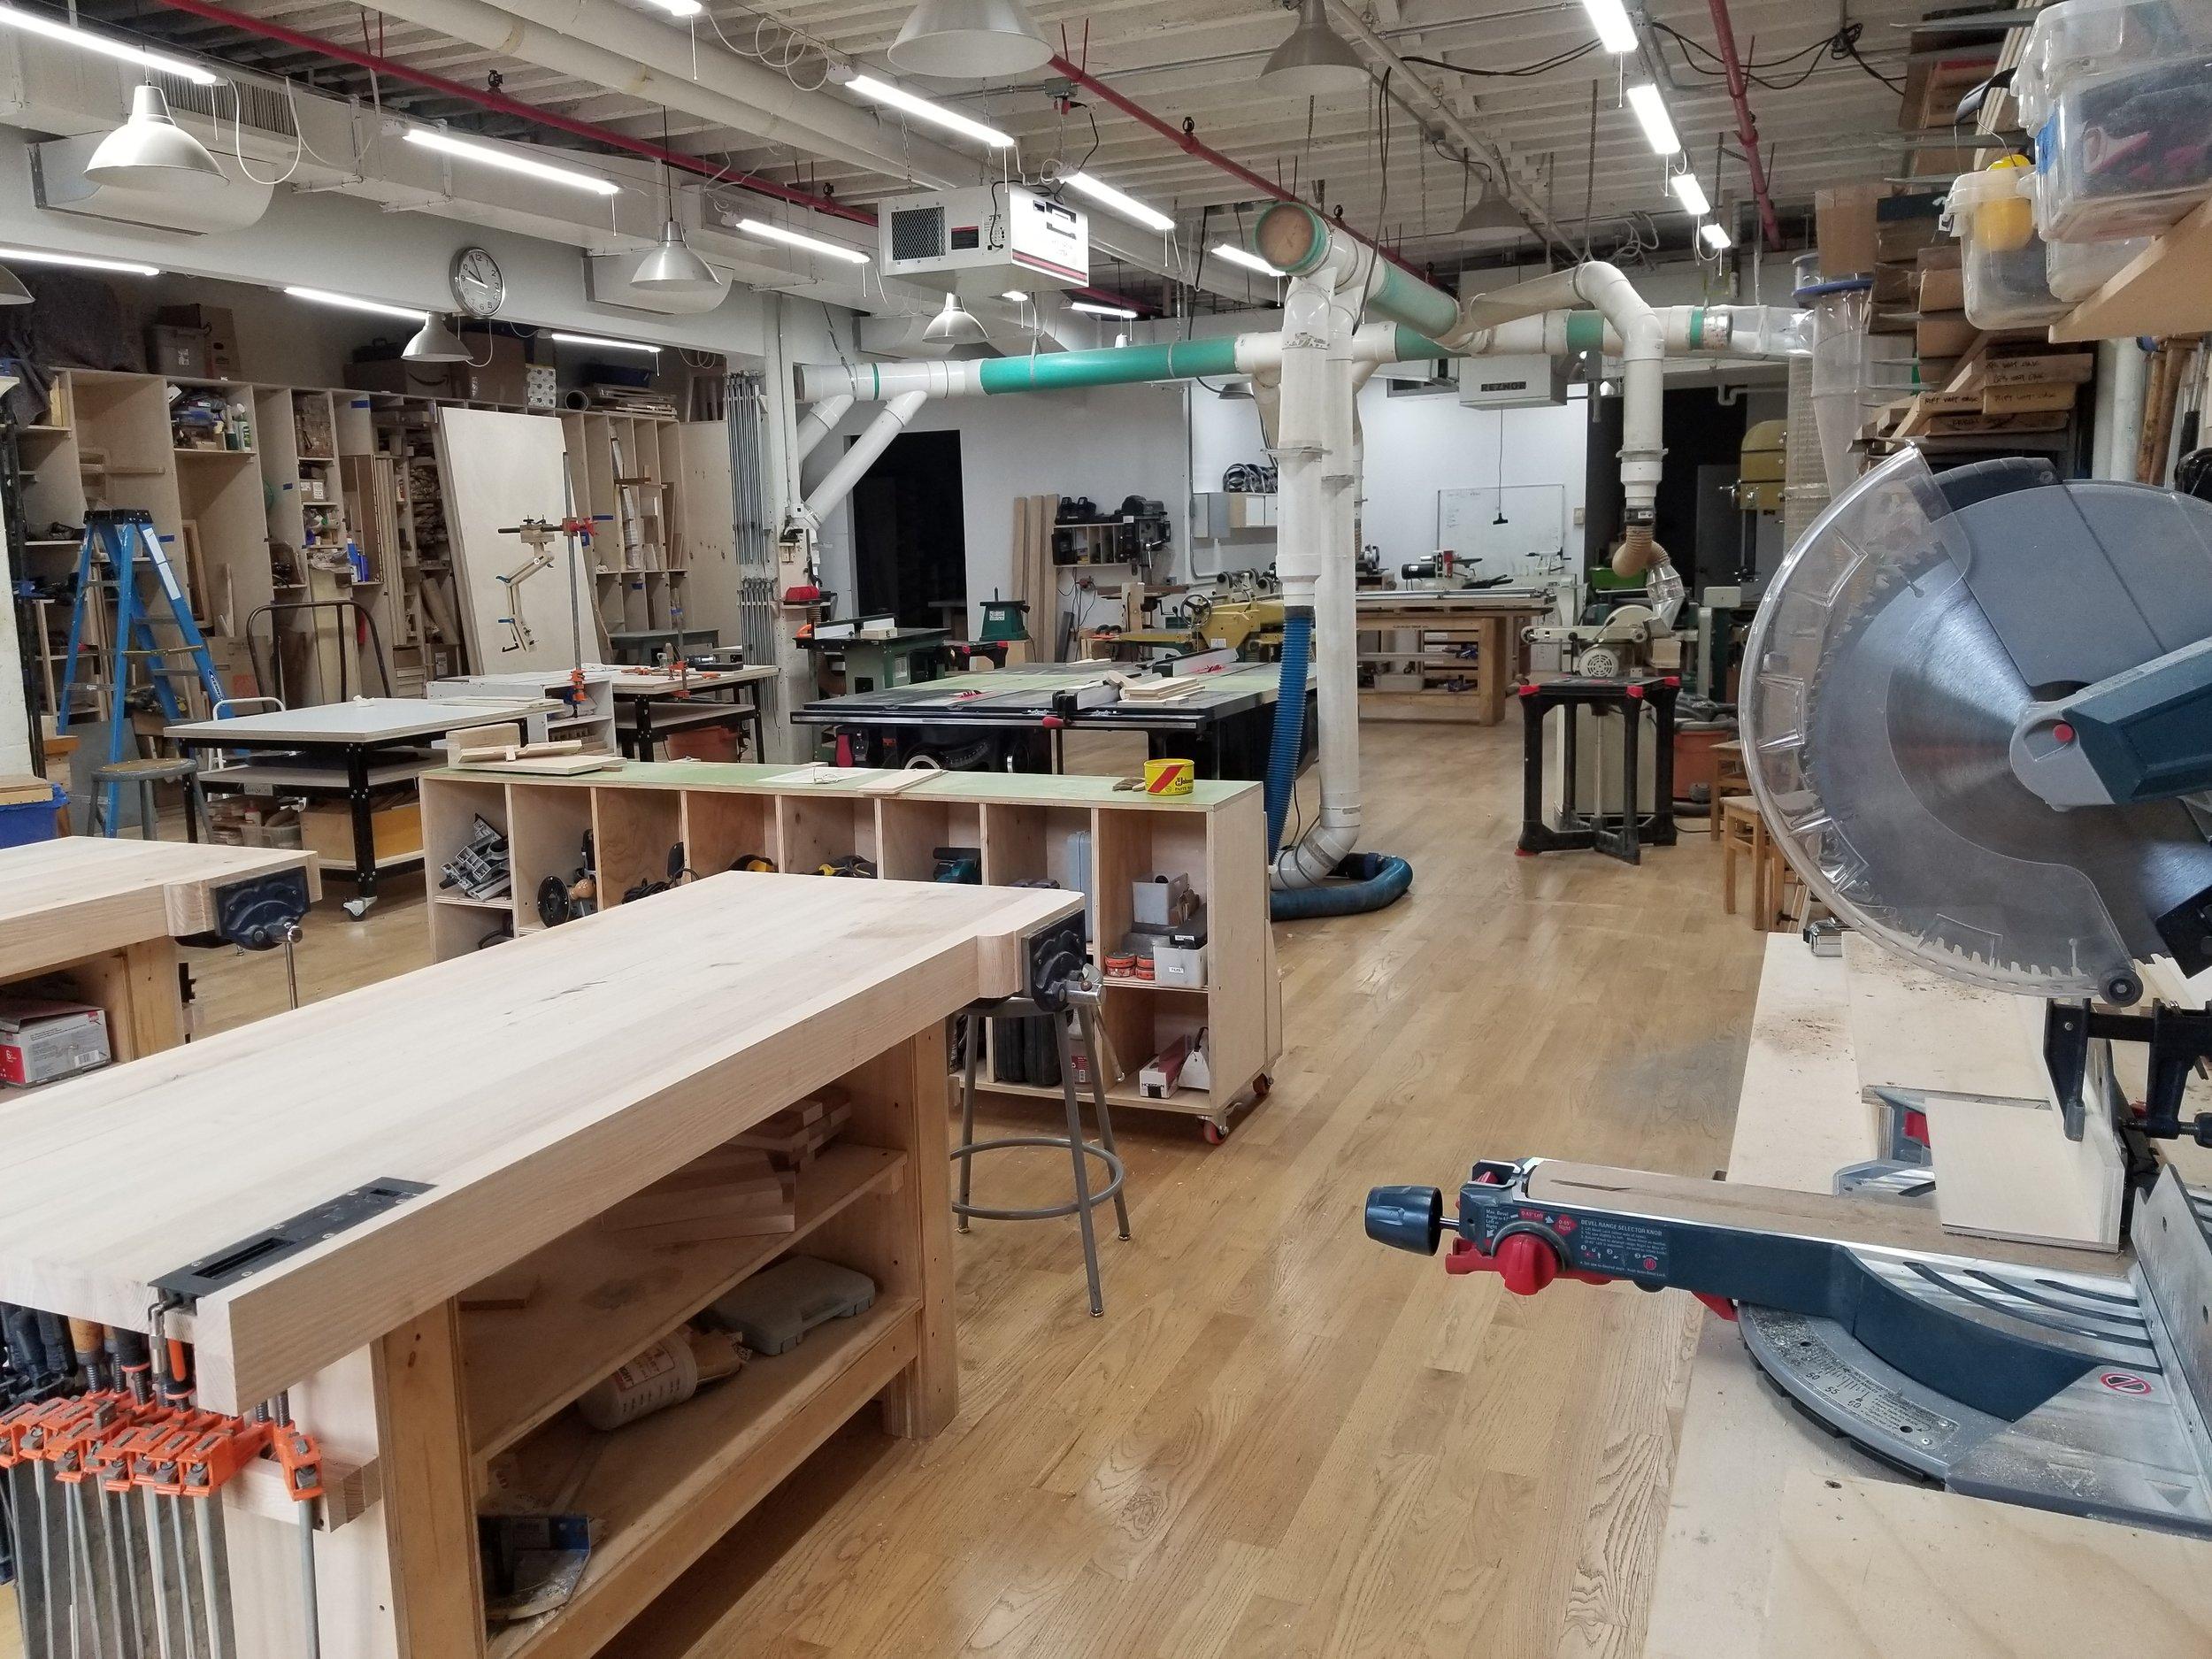 Space Tools Makeville Studio